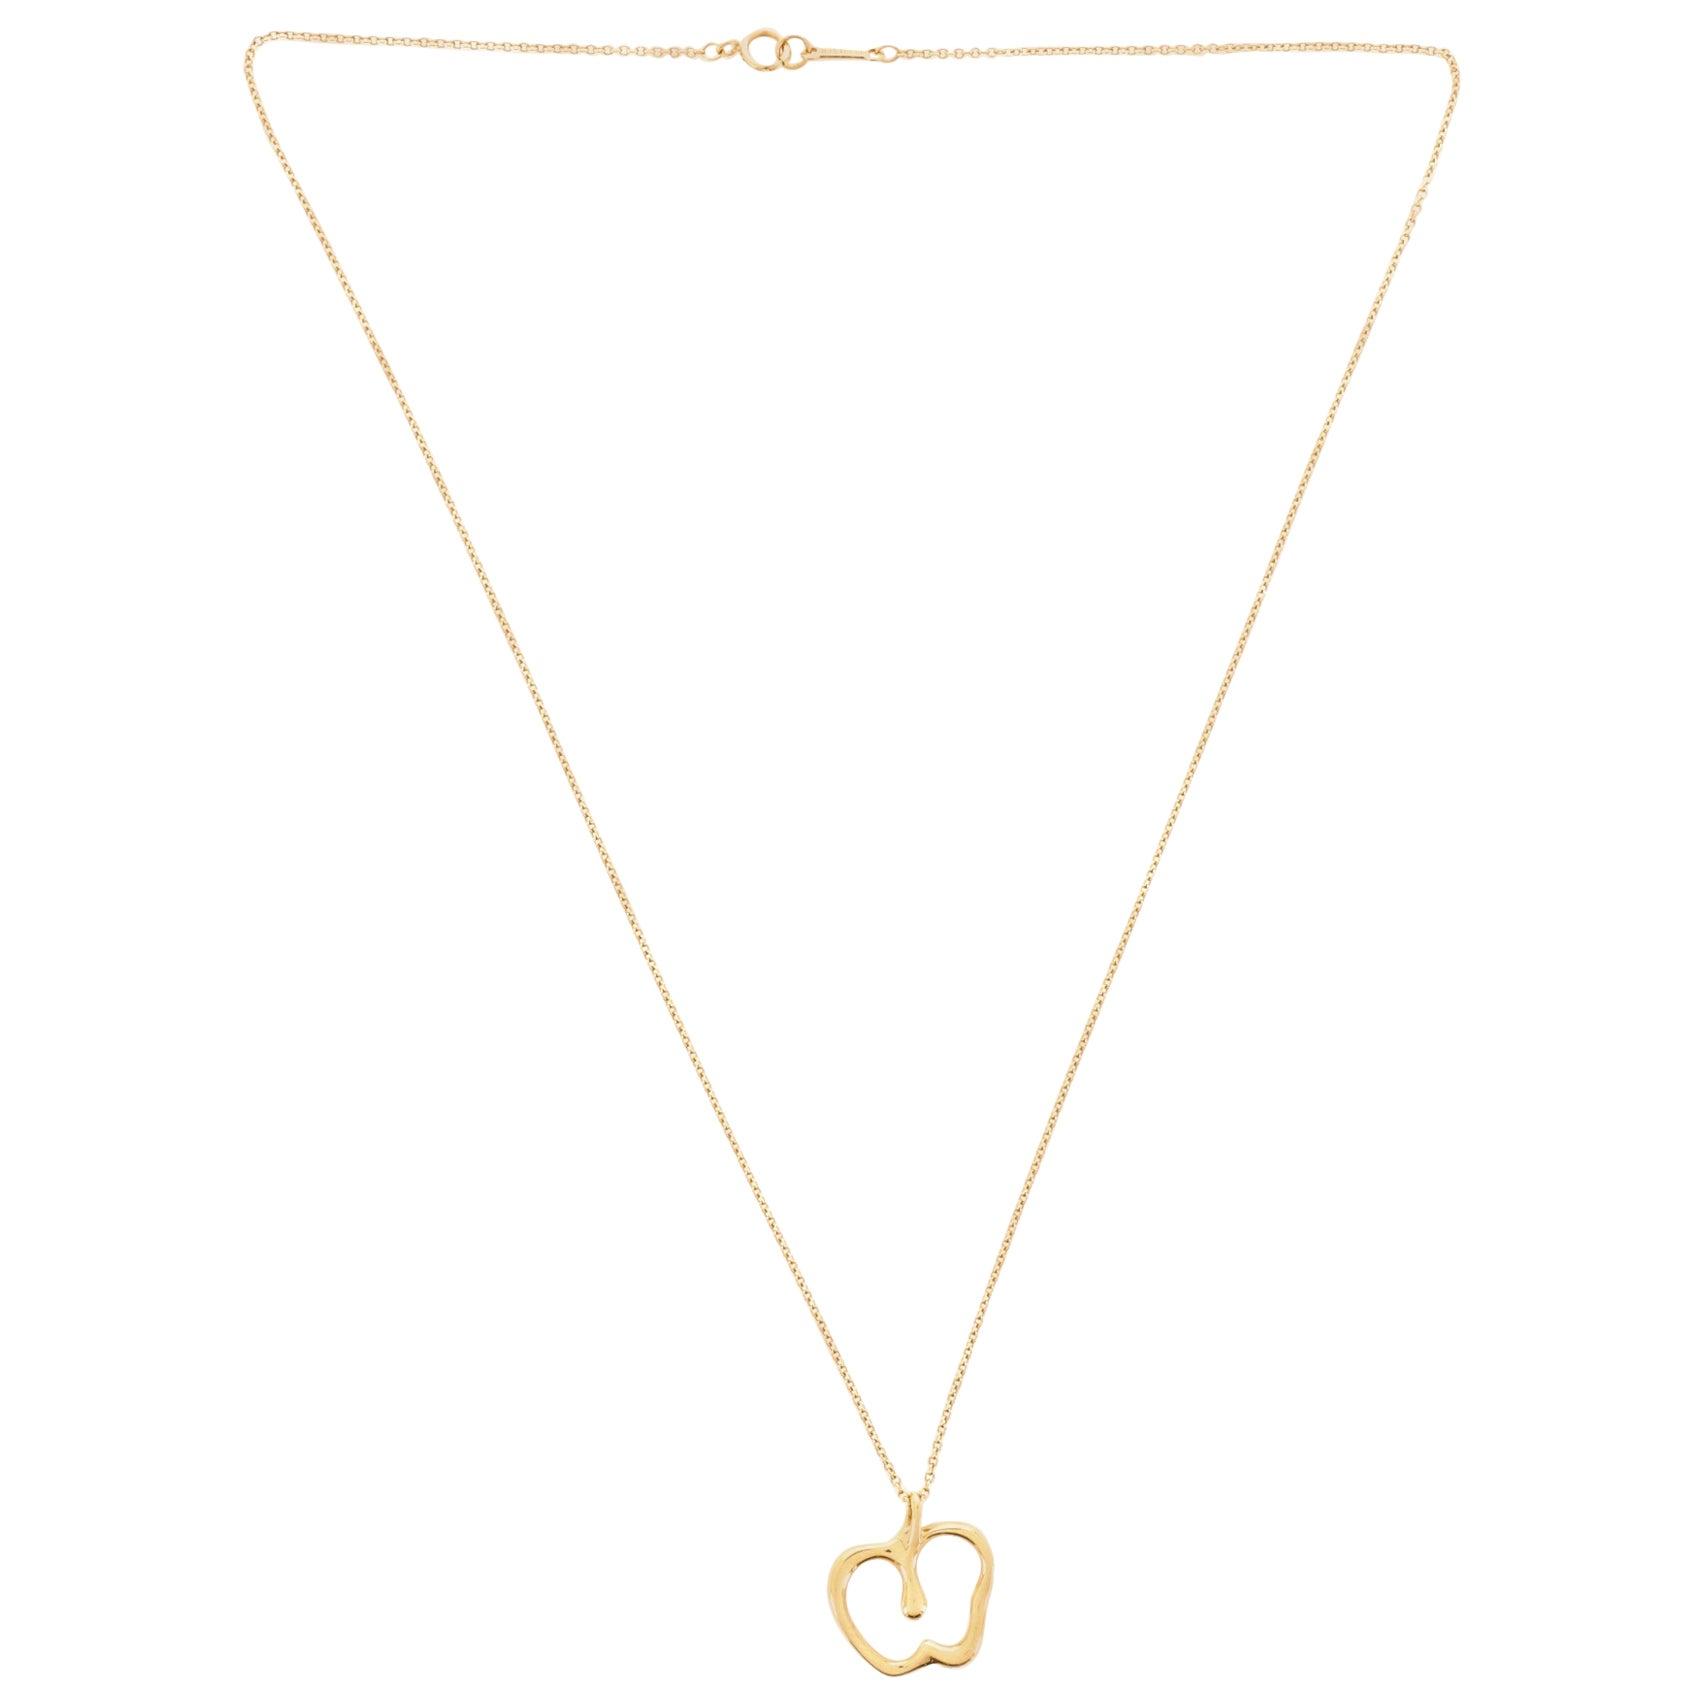 Tiffany & Co. Elsa Peretti Apple Pendant Necklace 18 Karat Yellow Gold